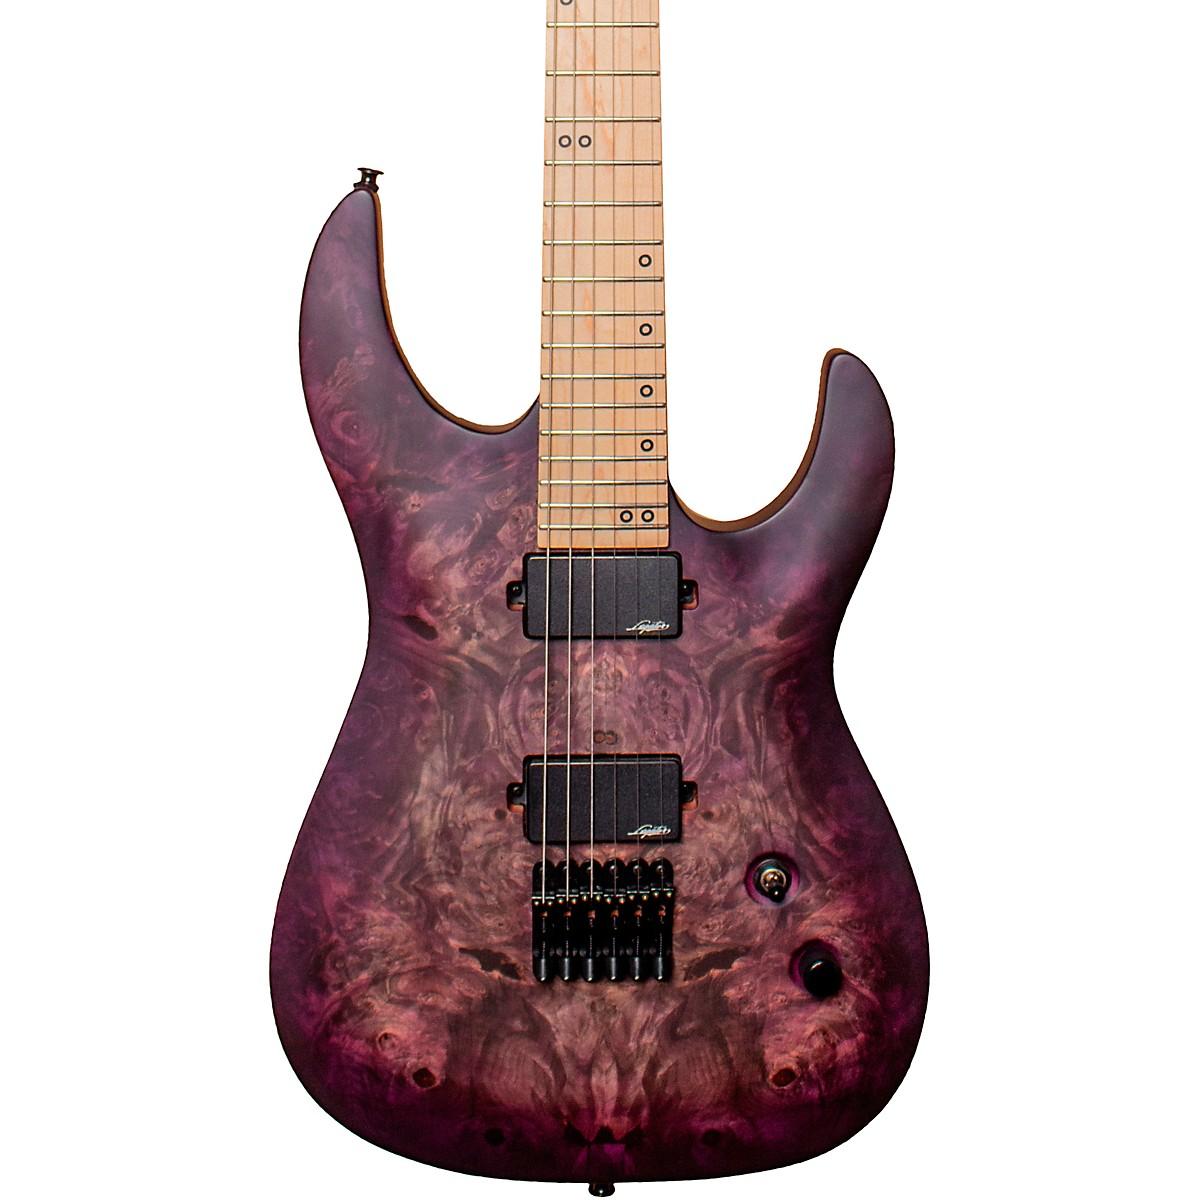 Legator Ninja Overdrive 6 Maple Fingerboard Electric Guitar